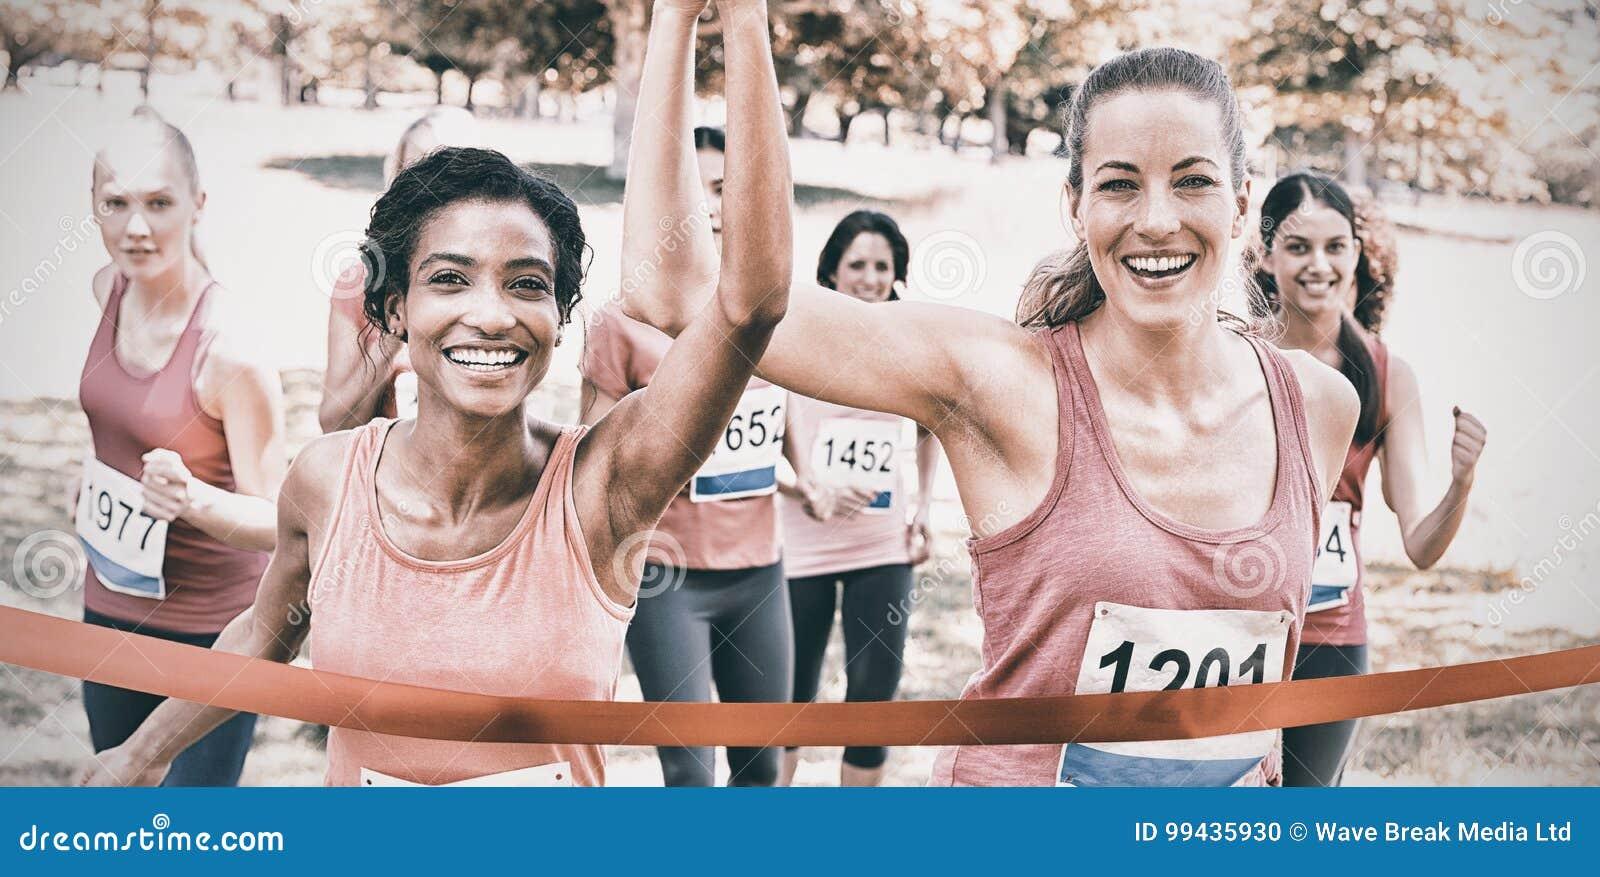 Bröstcancerdeltagare som korsar mållinjen på loppet